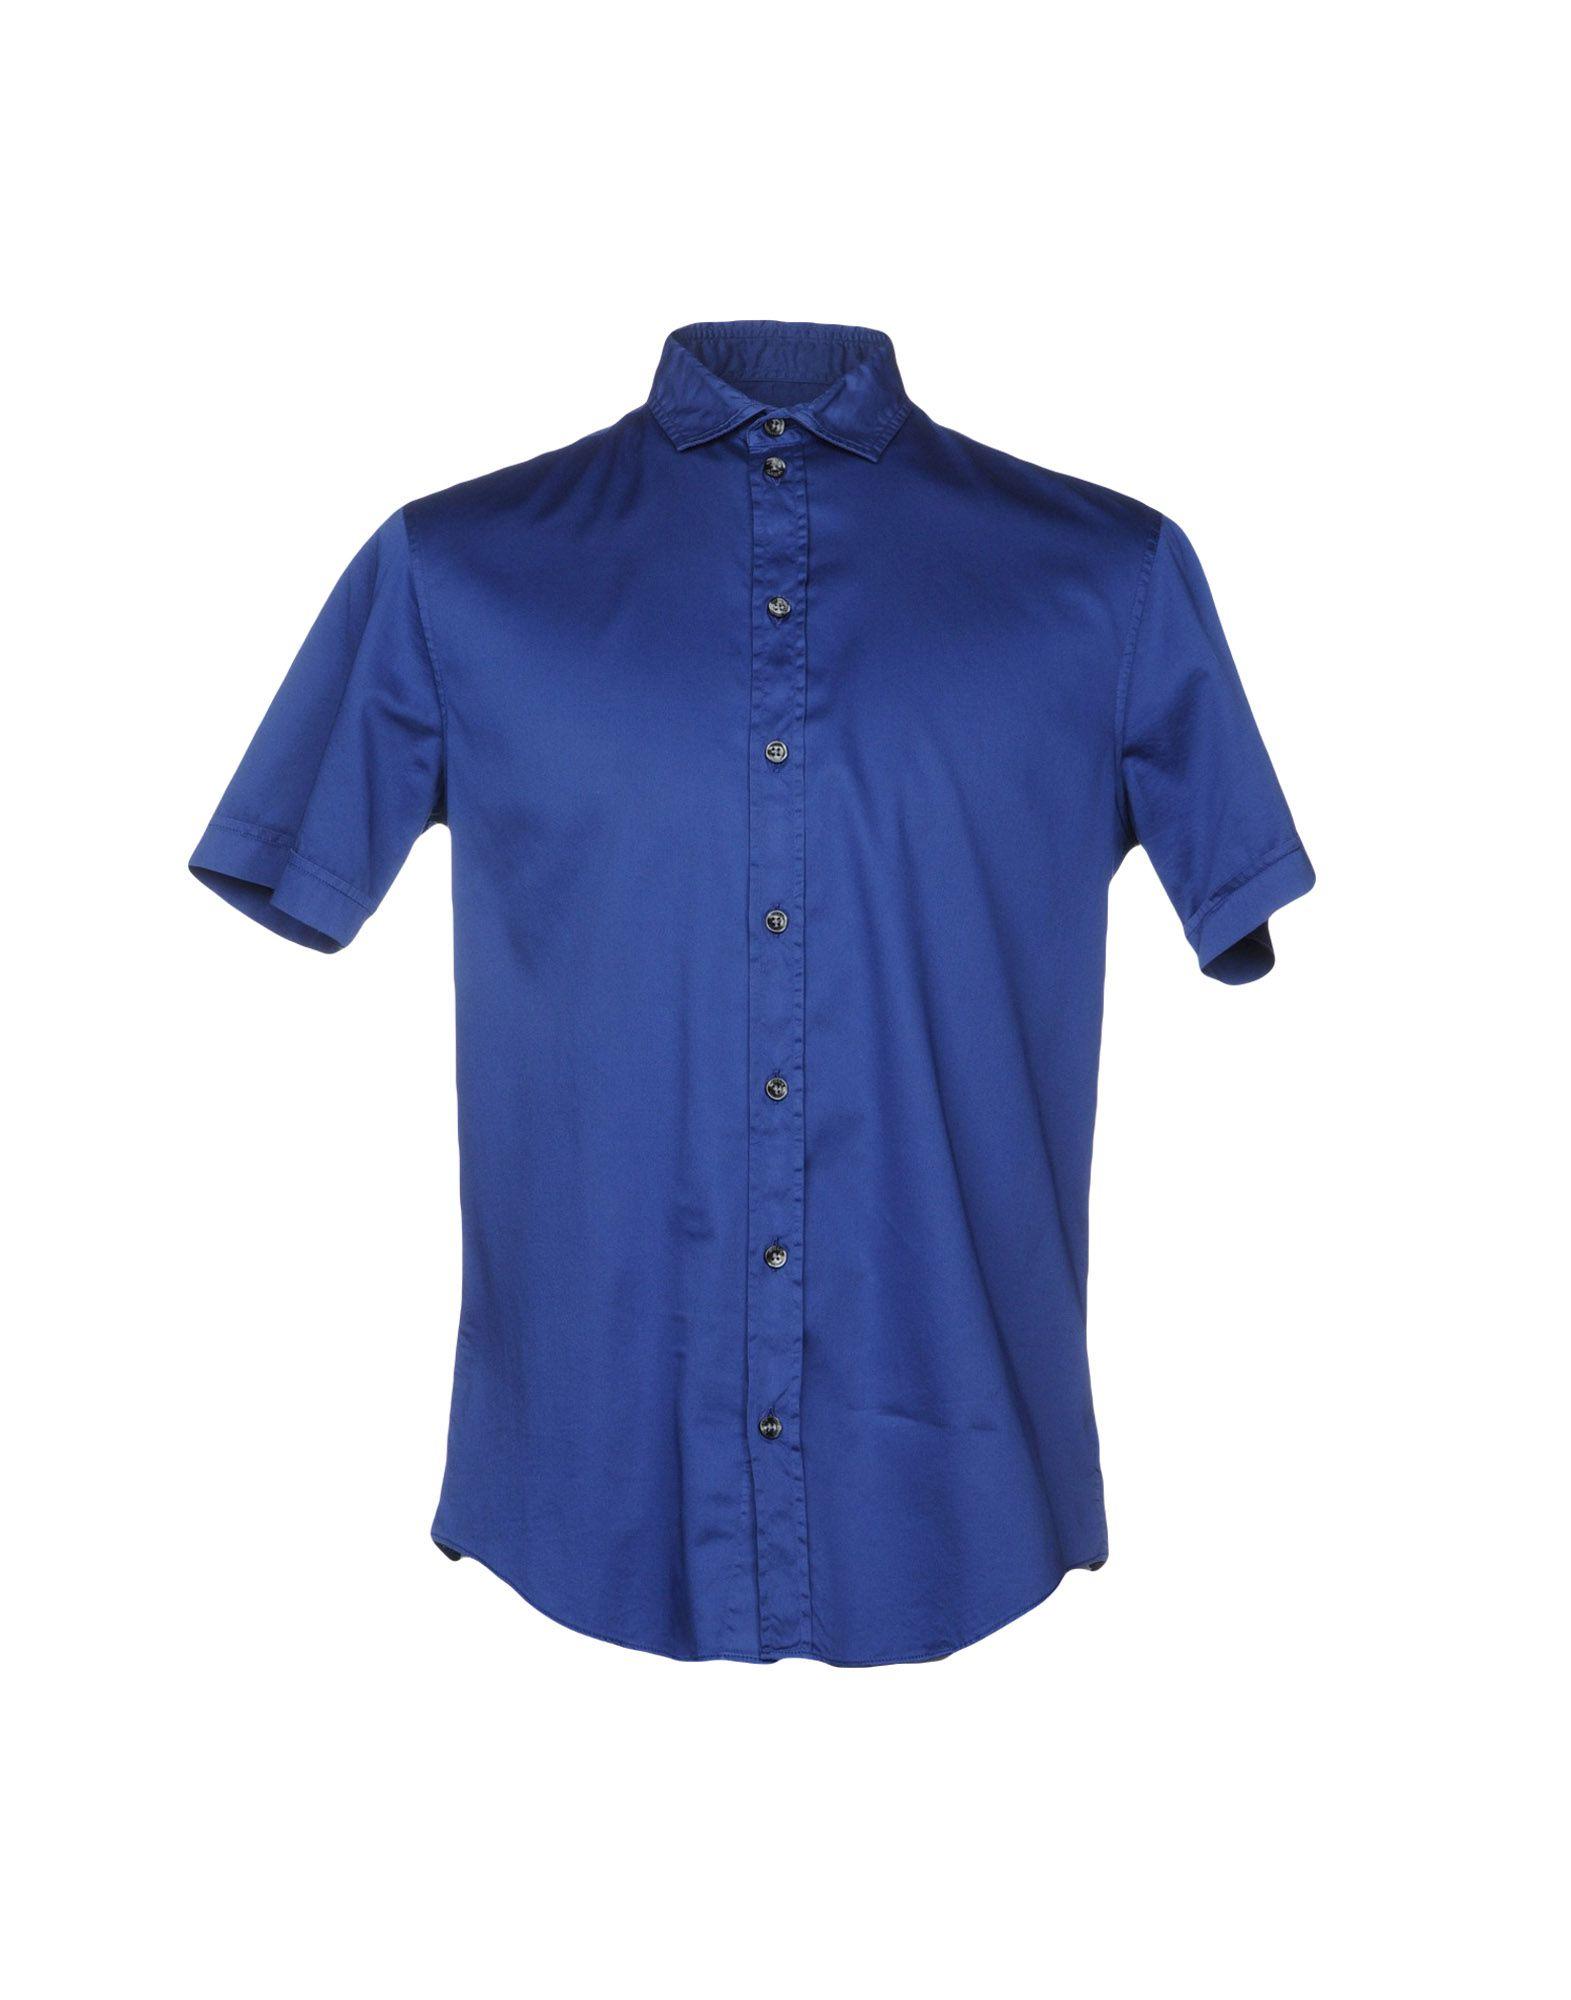 ARMANI COLLEZIONI Herren Hemd Farbe Blau Größe 4